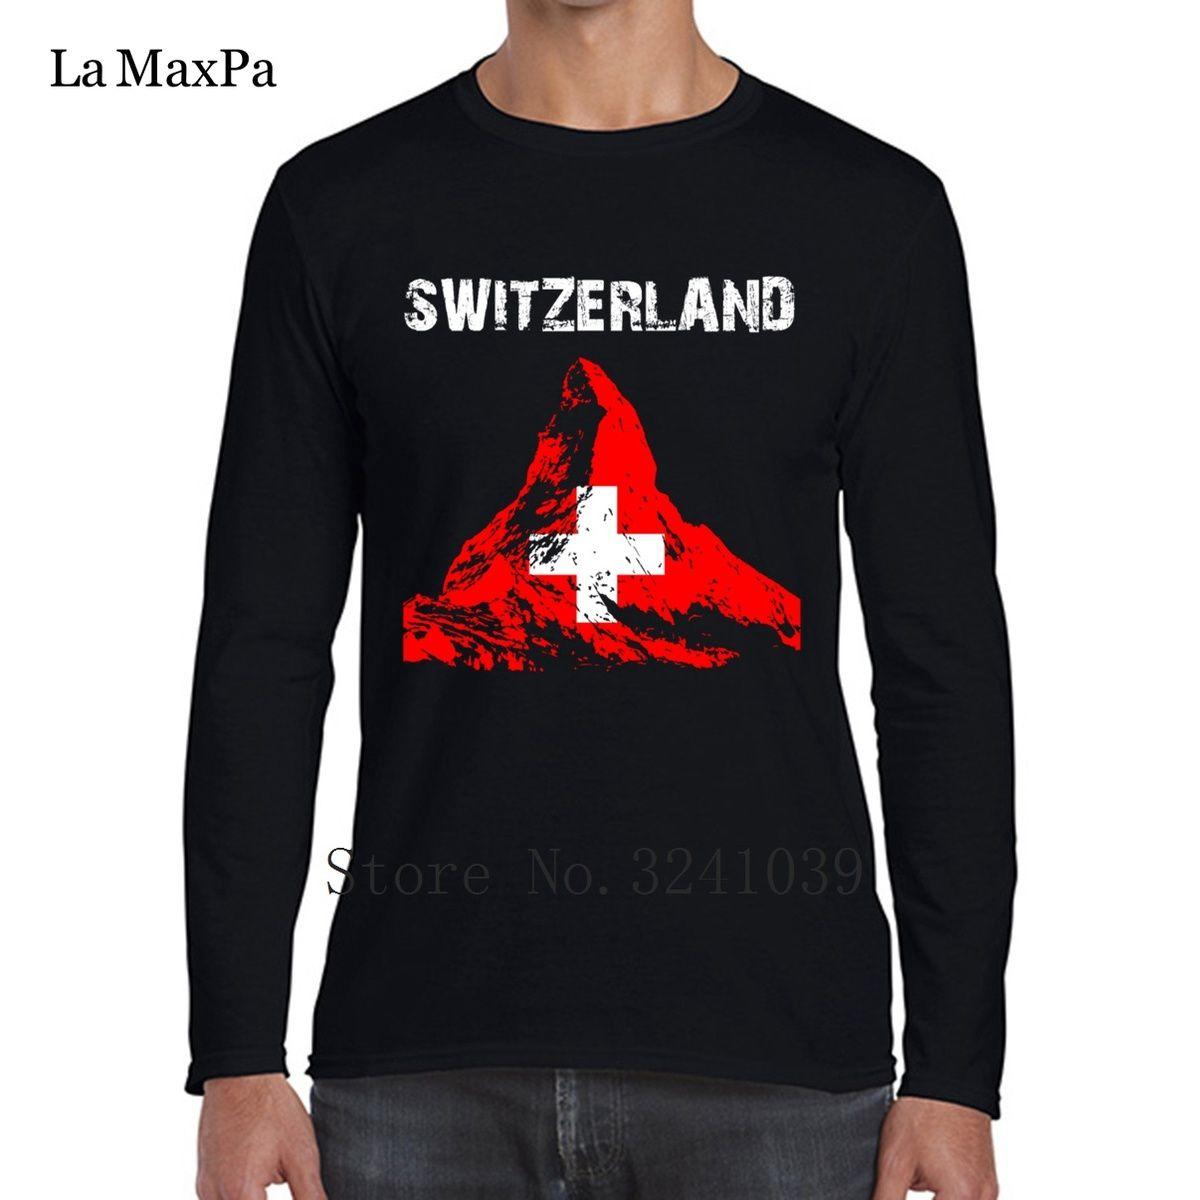 28475b97a1f4 La Maxpa Nation Design Switzerland Matterhorn Fit Men Tee Shirt Sunlight  Men S T Shirt Mens Clothes Round Collar Tshirt Large Great T Shirts Buy T  Shirt ...